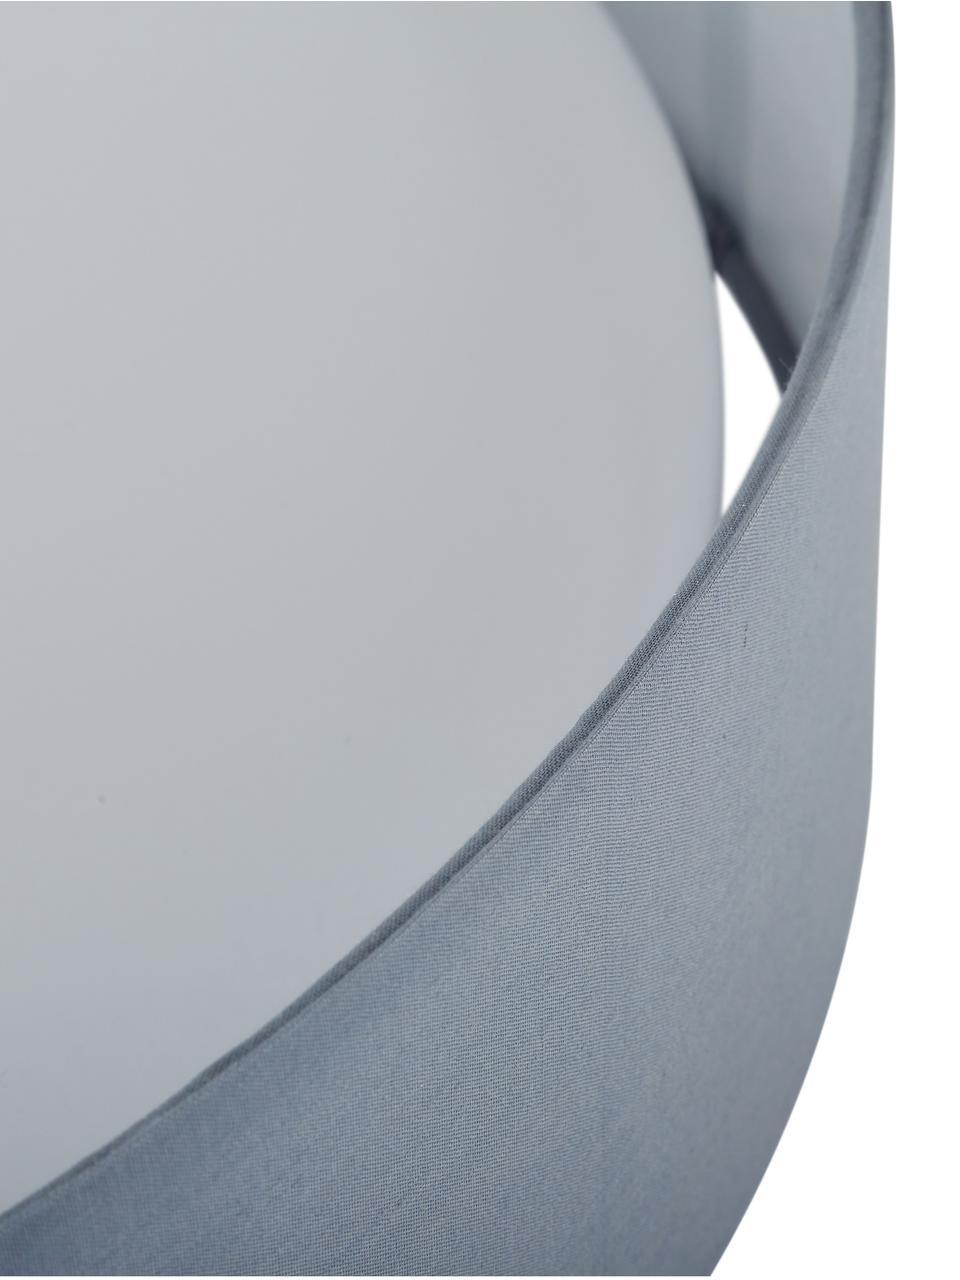 Plafoniera a LED grigia Helen, Struttura: metallo, Grigio, Ø 52 x Alt. 11 cm